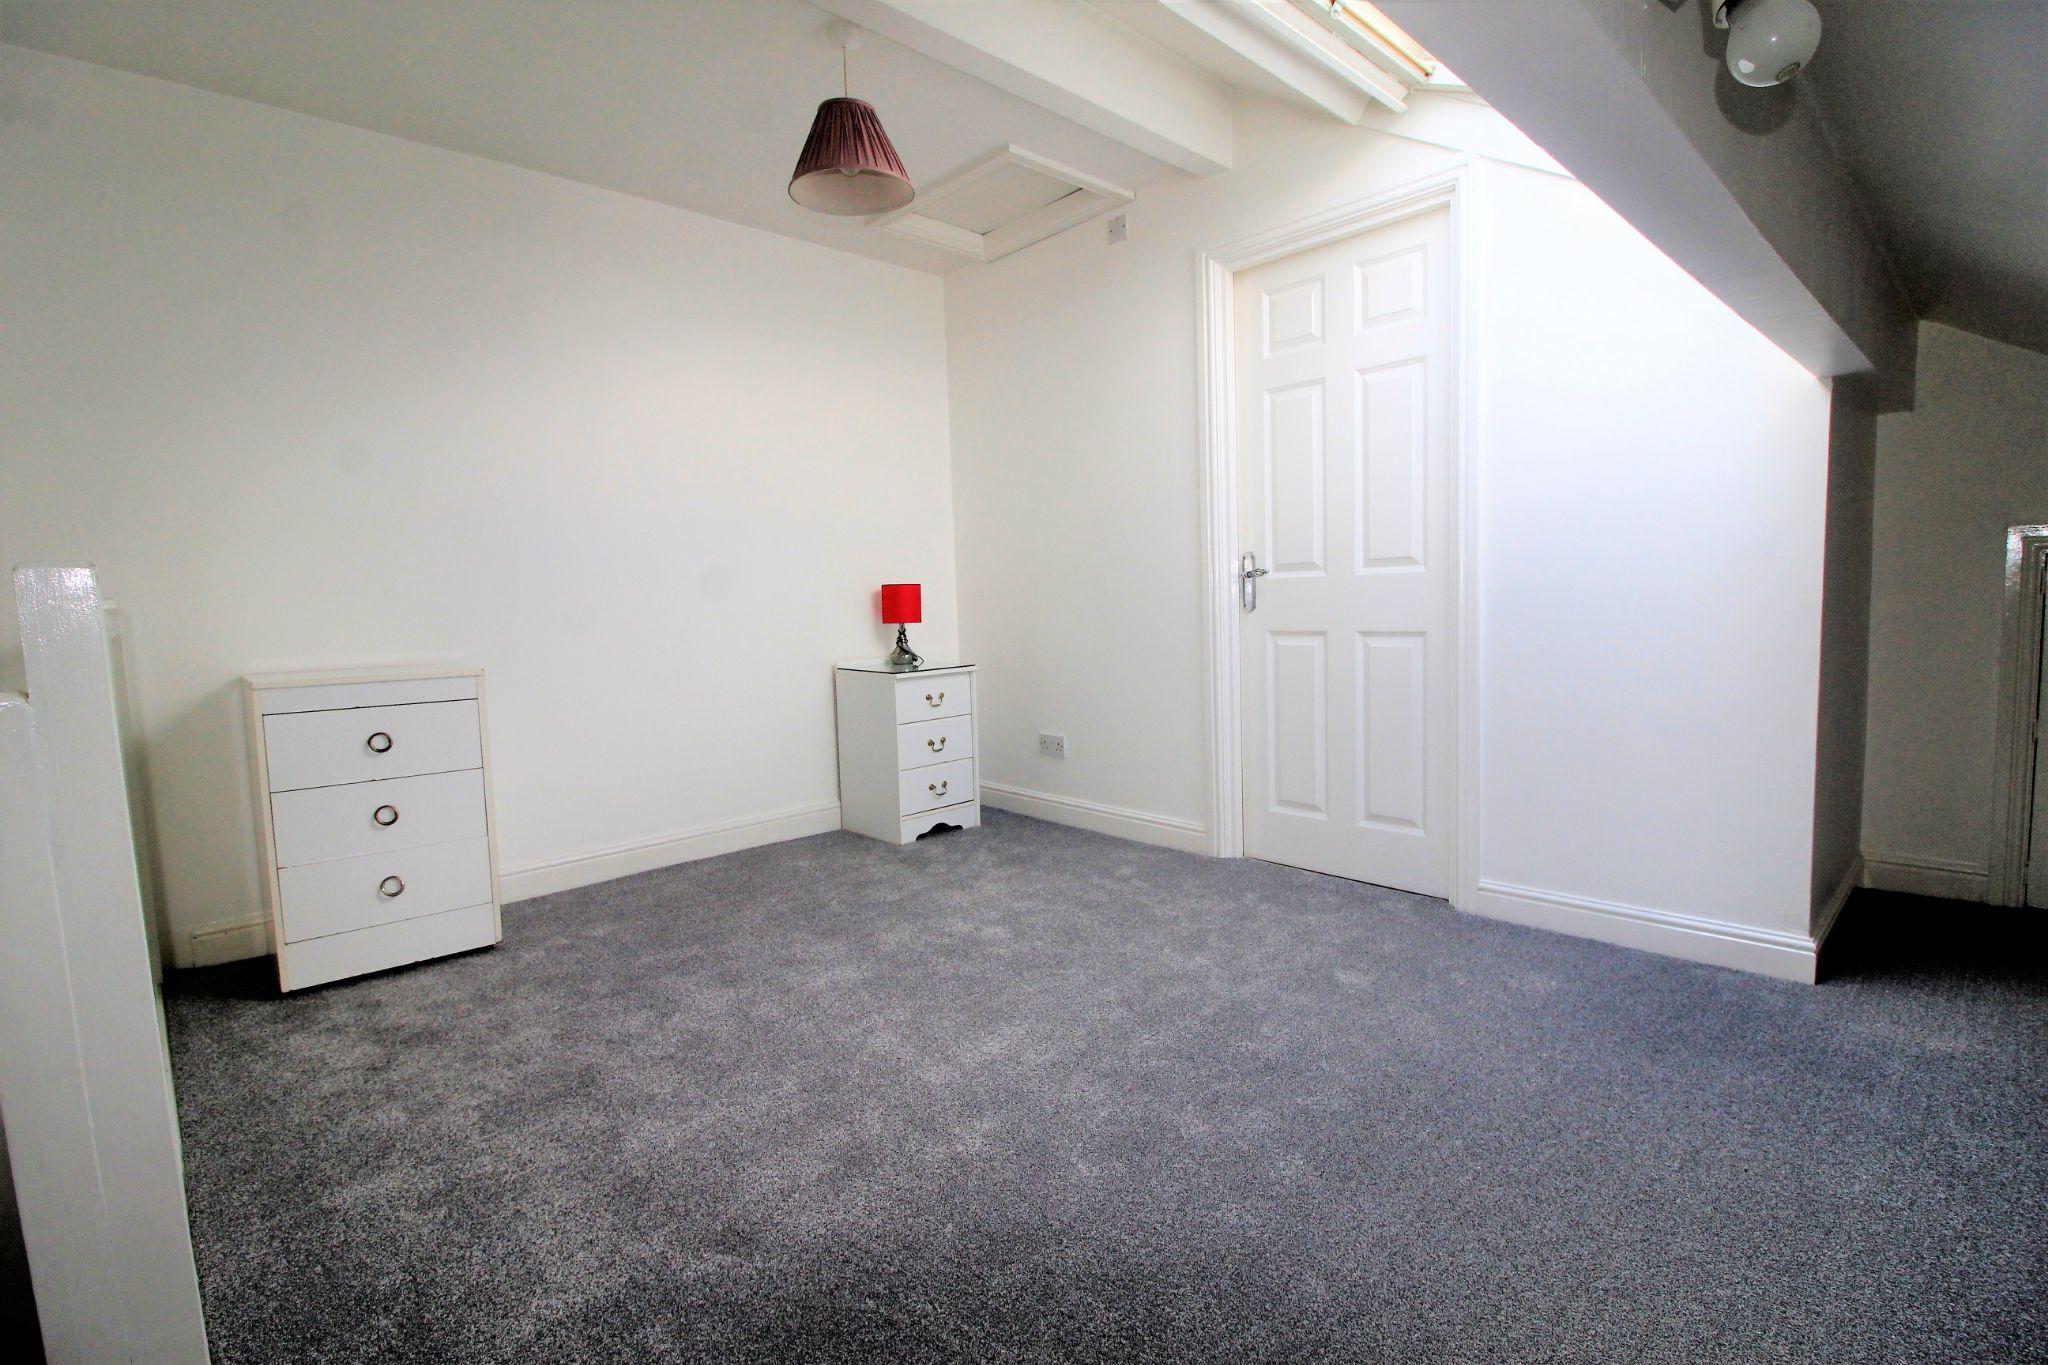 1 bedroom flat flat/apartment Let in Huddersfield - Bedroom 1